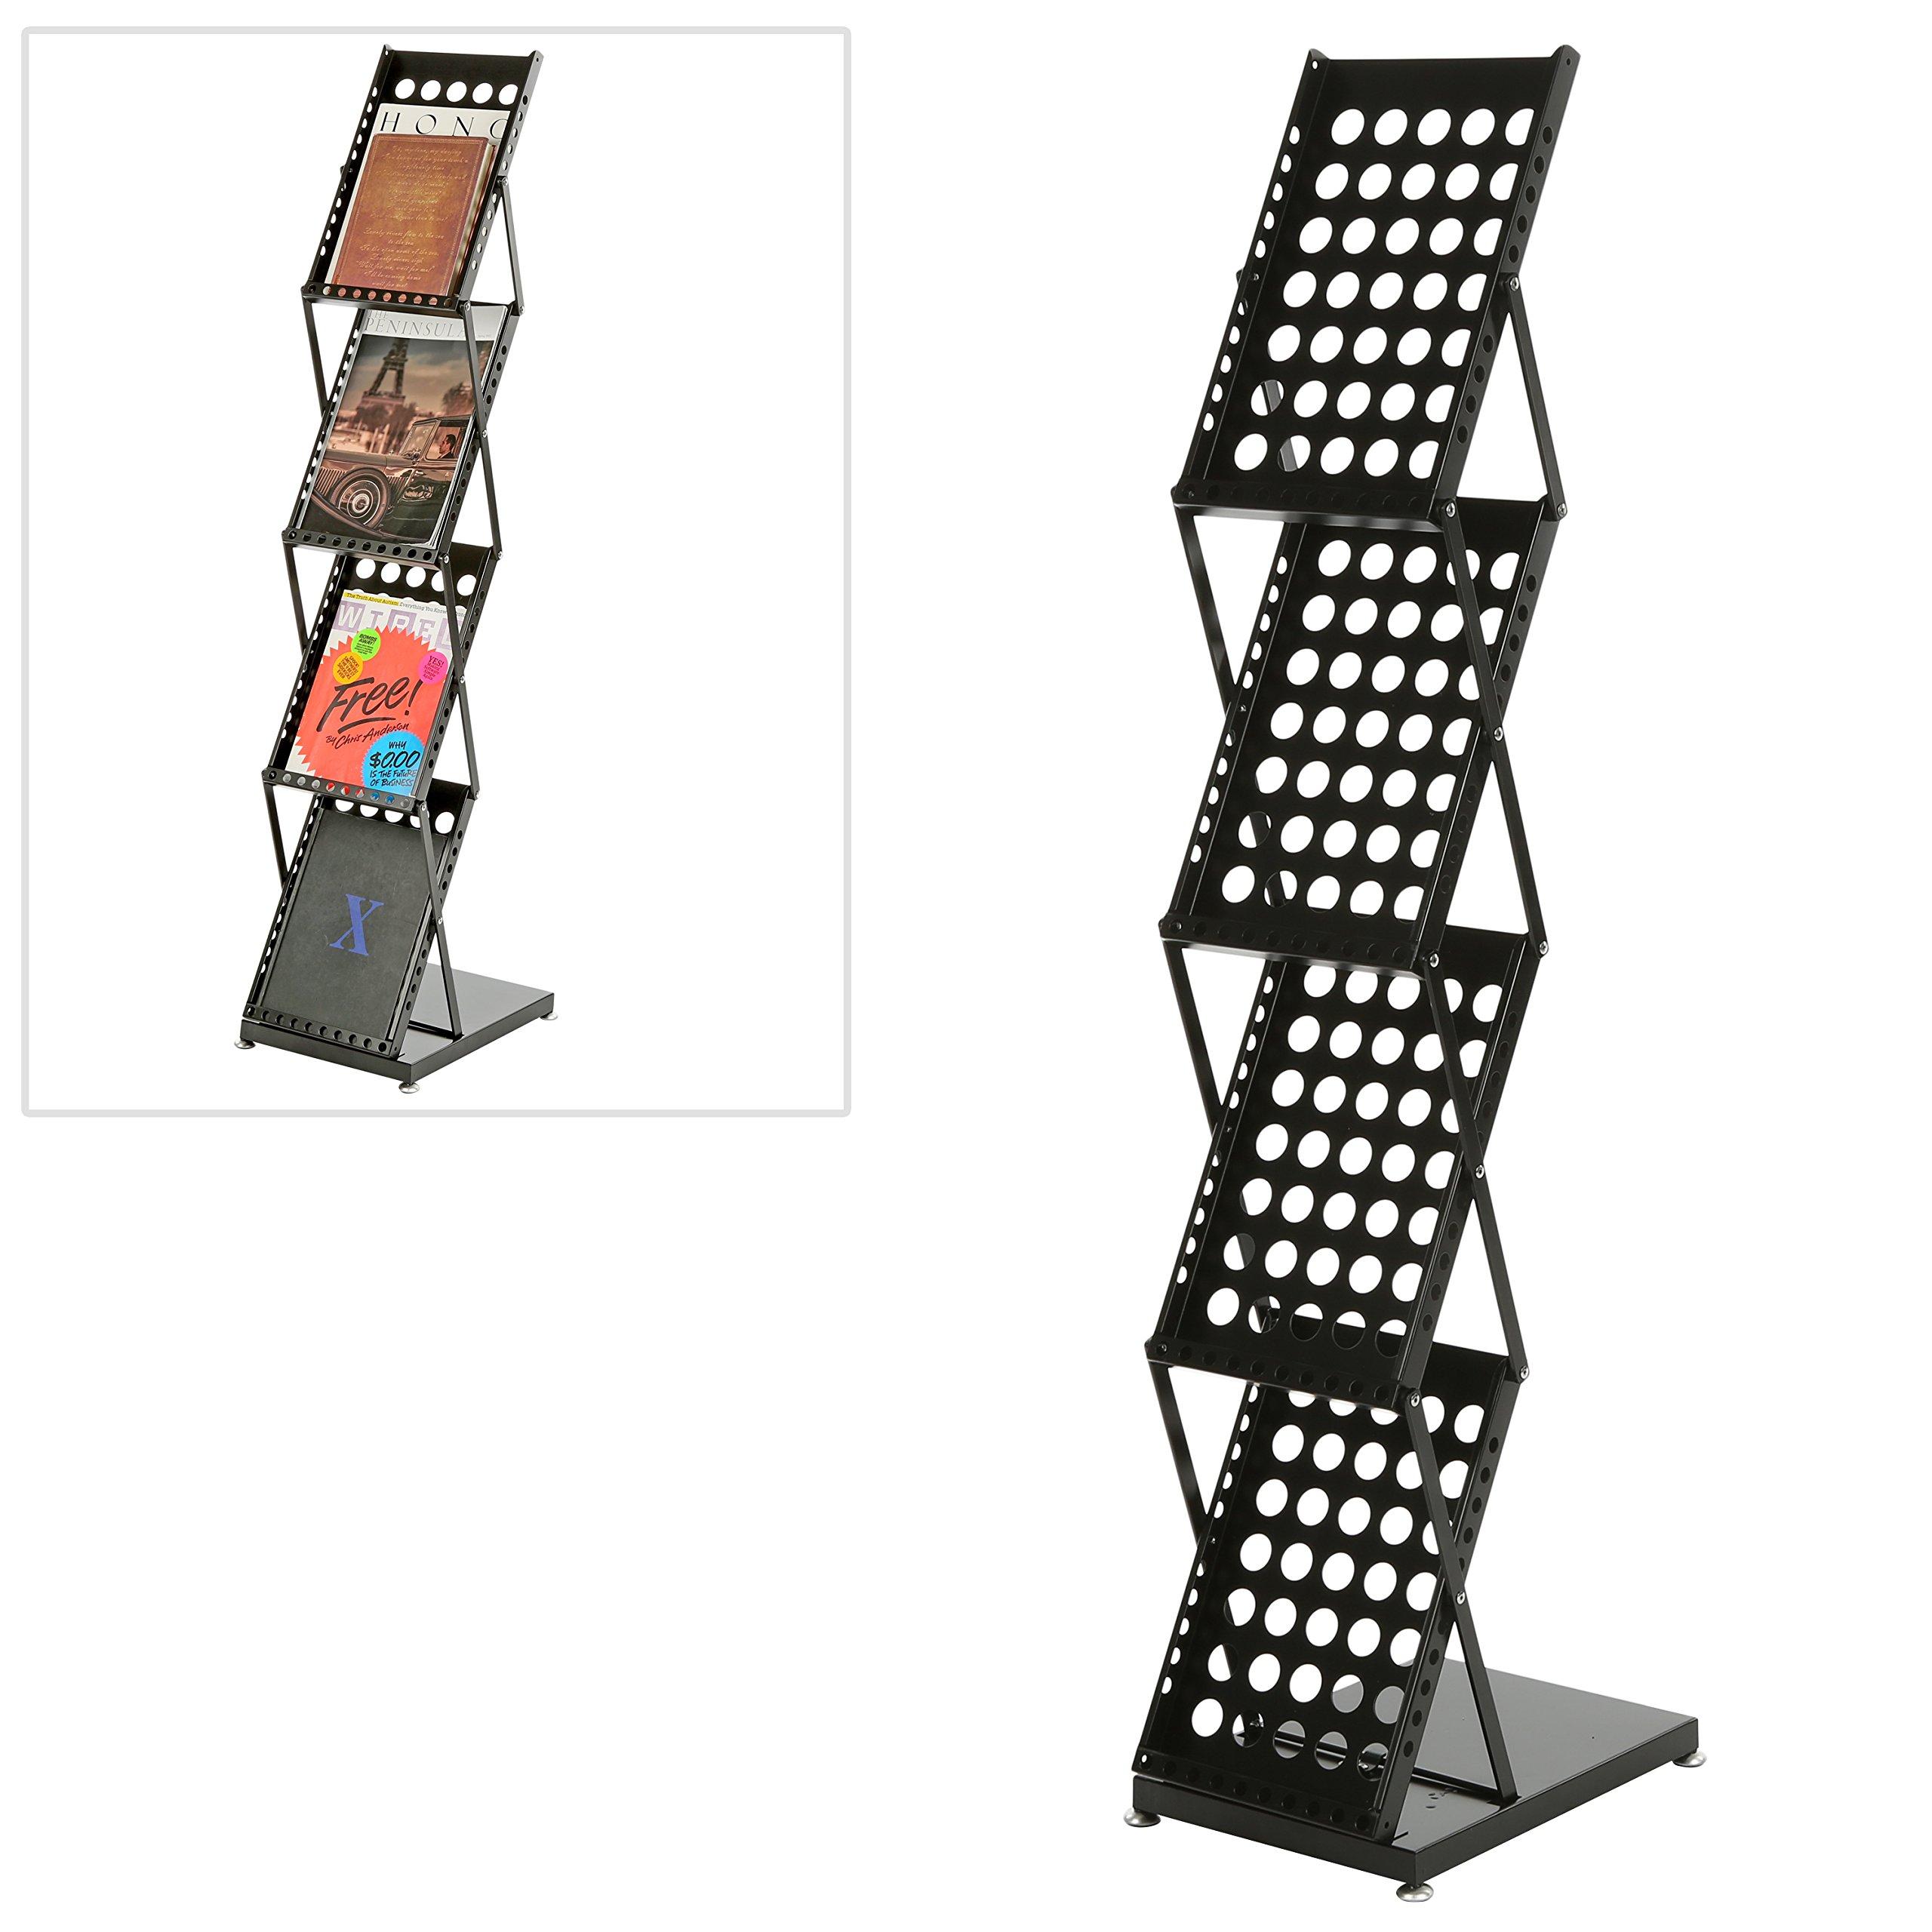 Modern Folding 4 Tier Metal Magazine Rack, Freestanding Literature Display Stand, Black